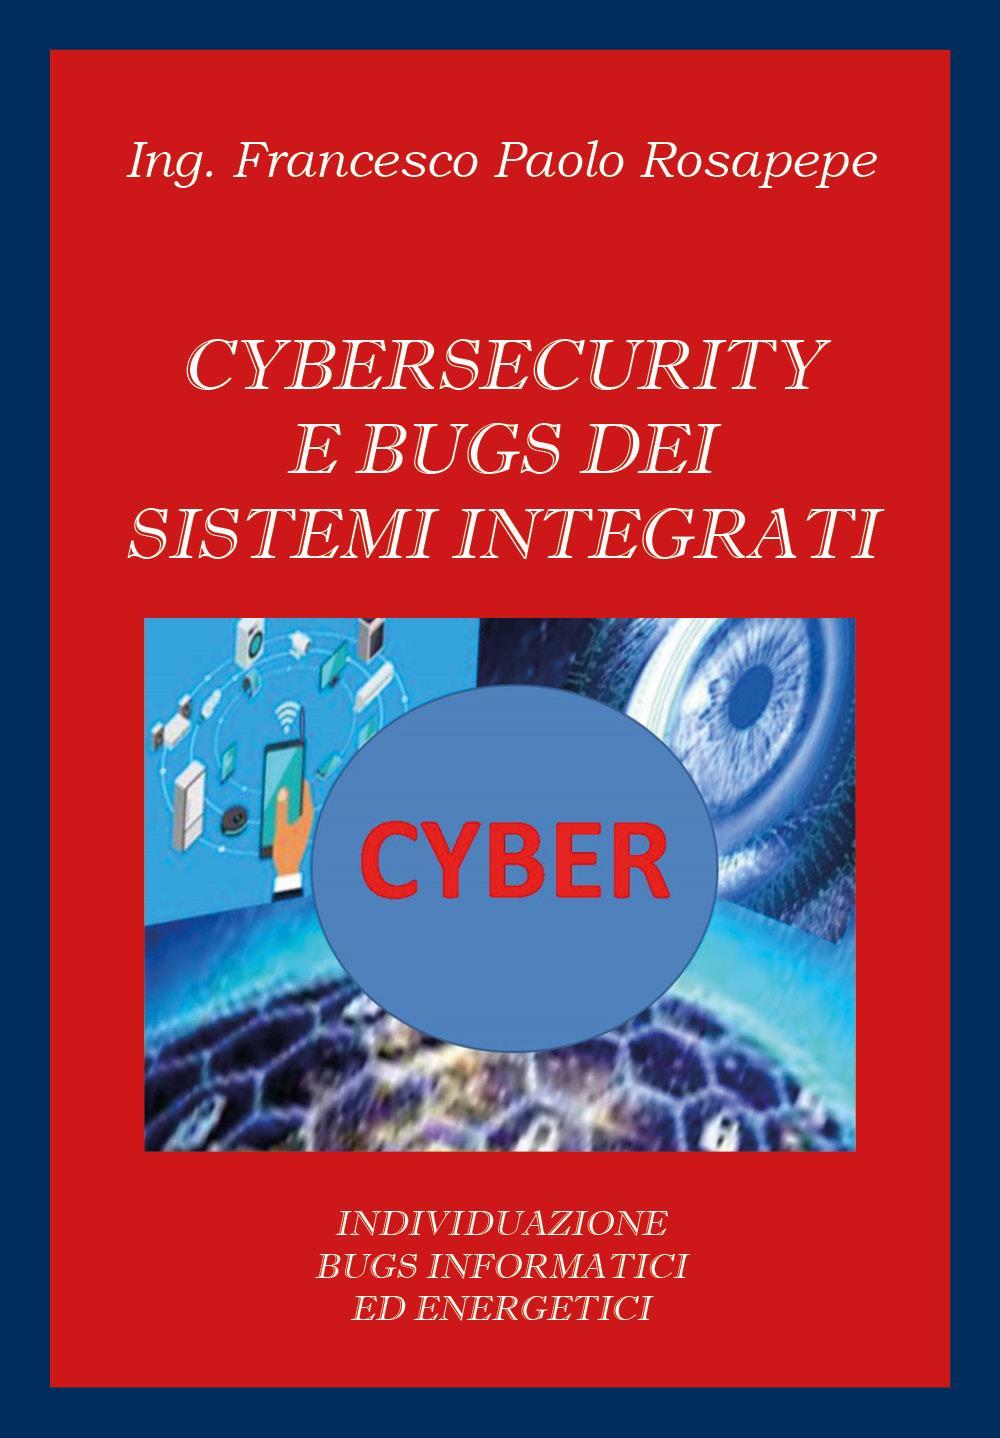 Cybersecurity e bugs dei sistemi integrati